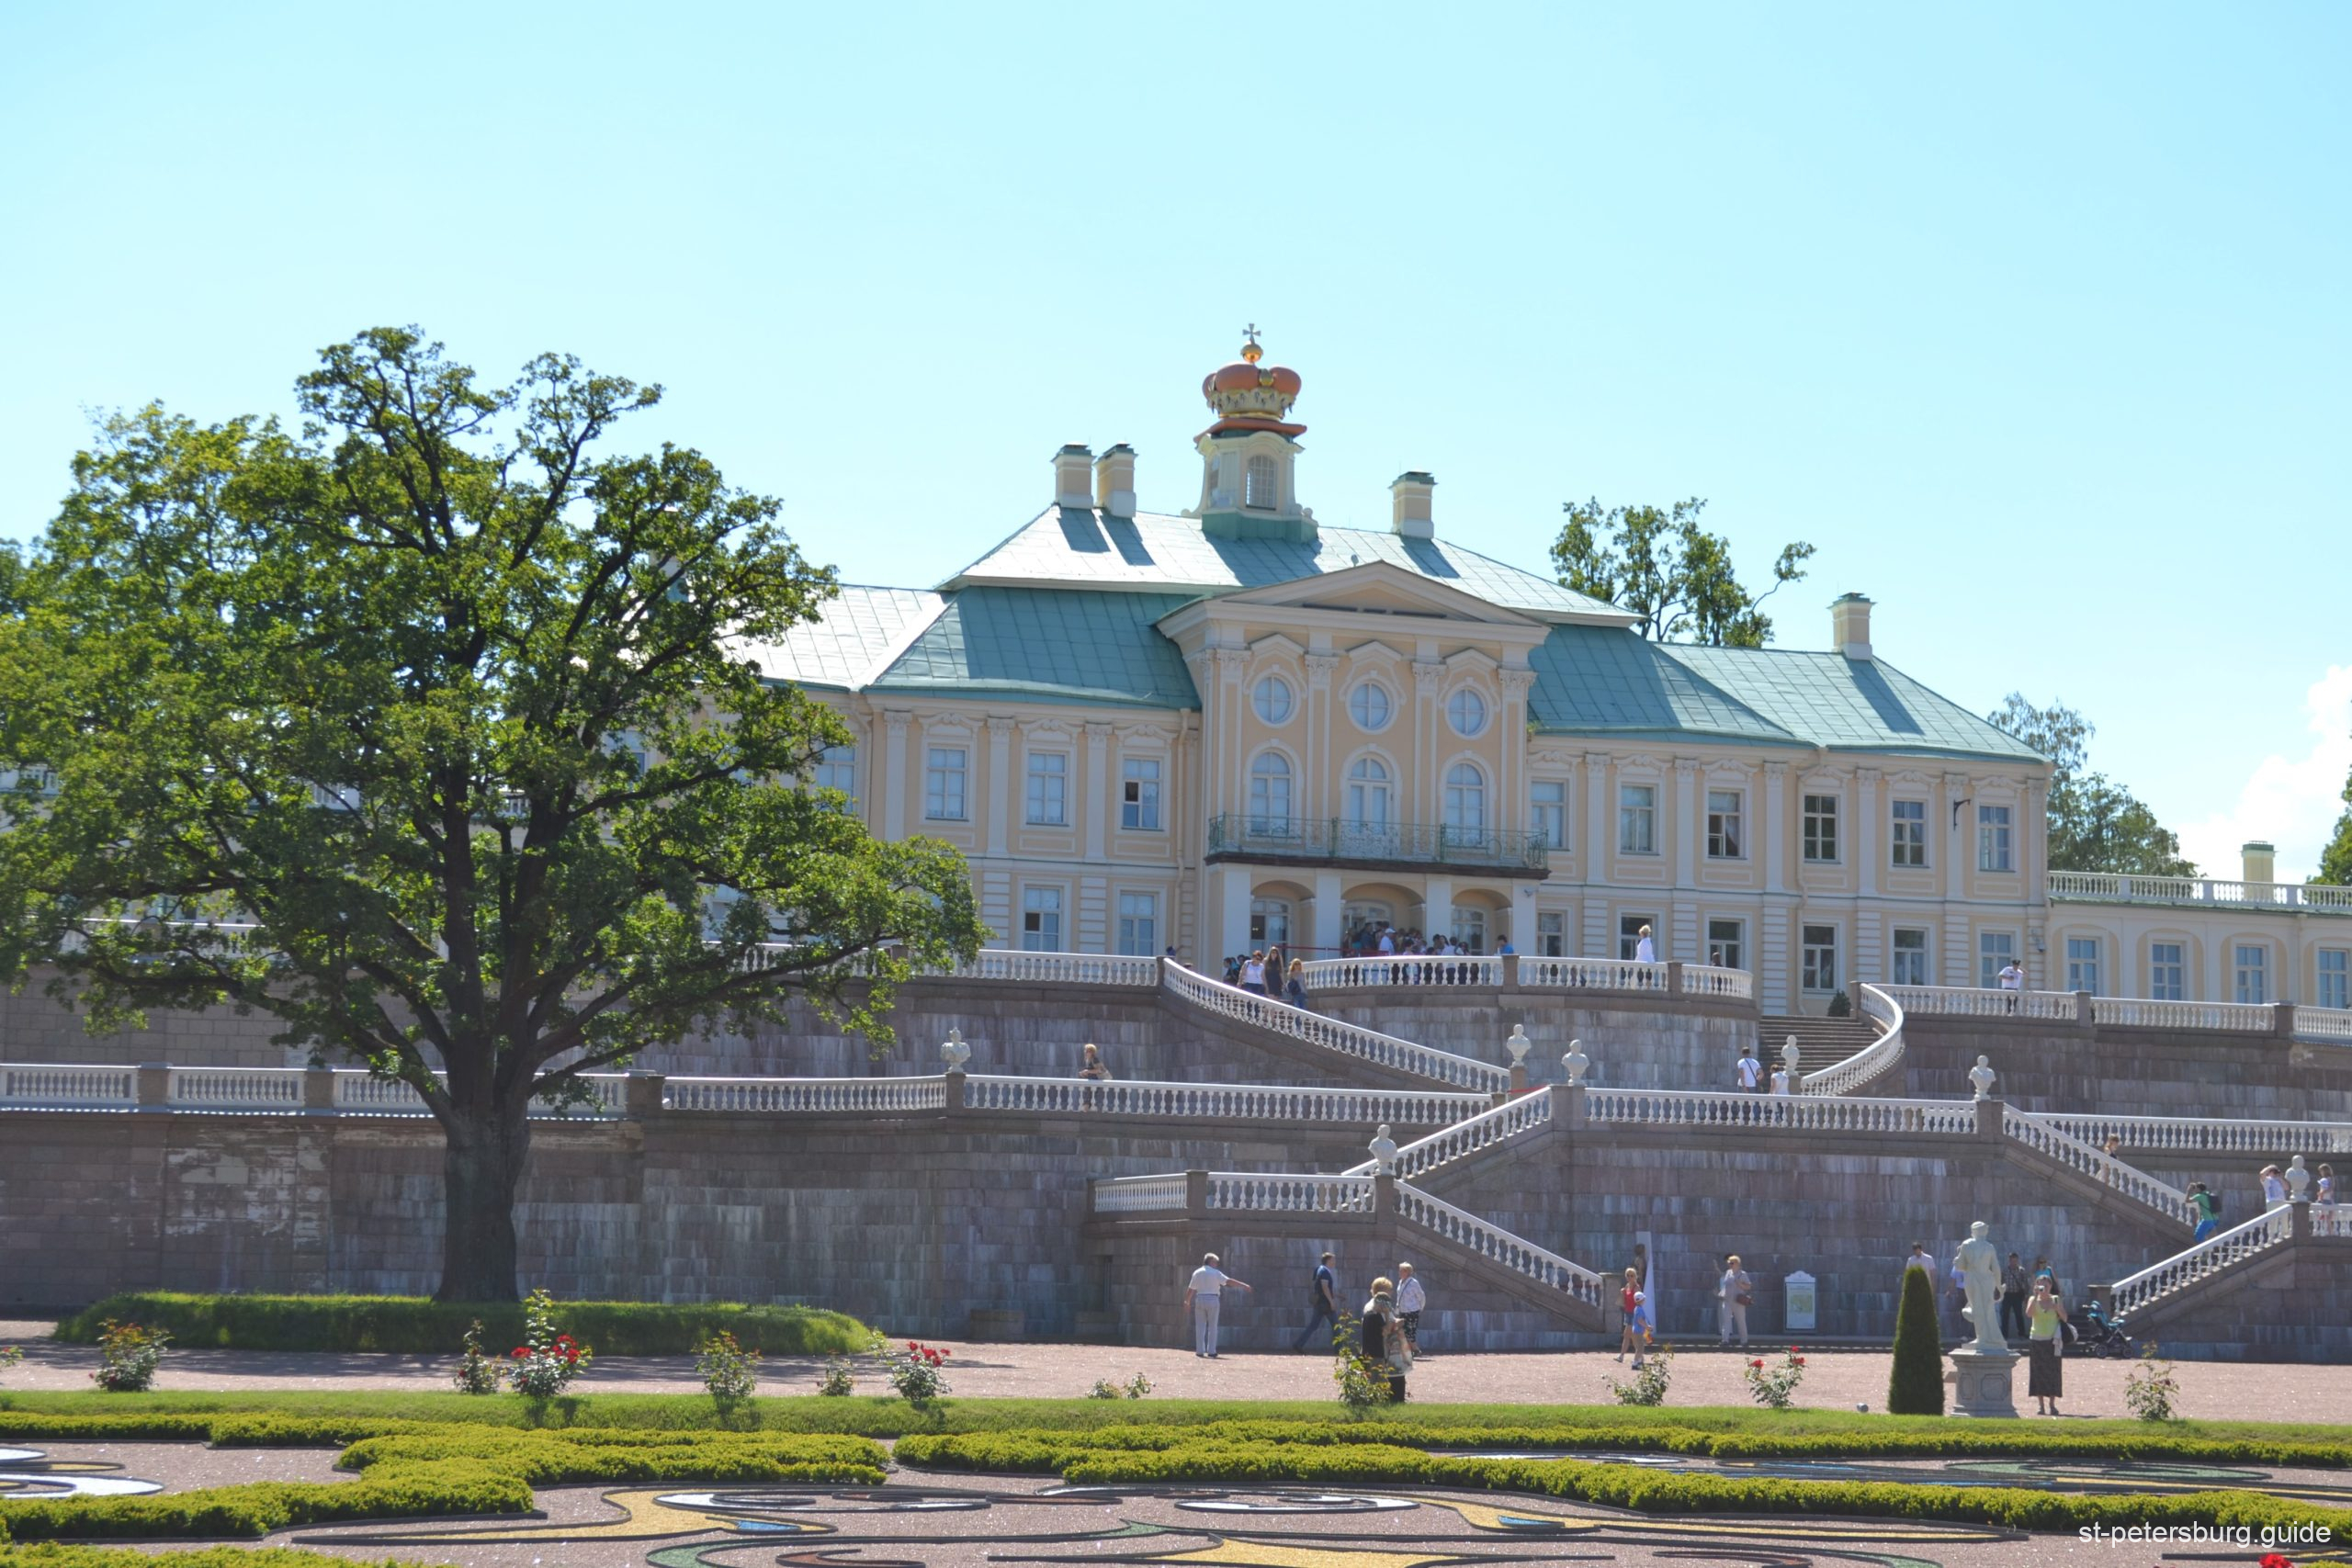 Panorama view on the palace in Oranienbaum